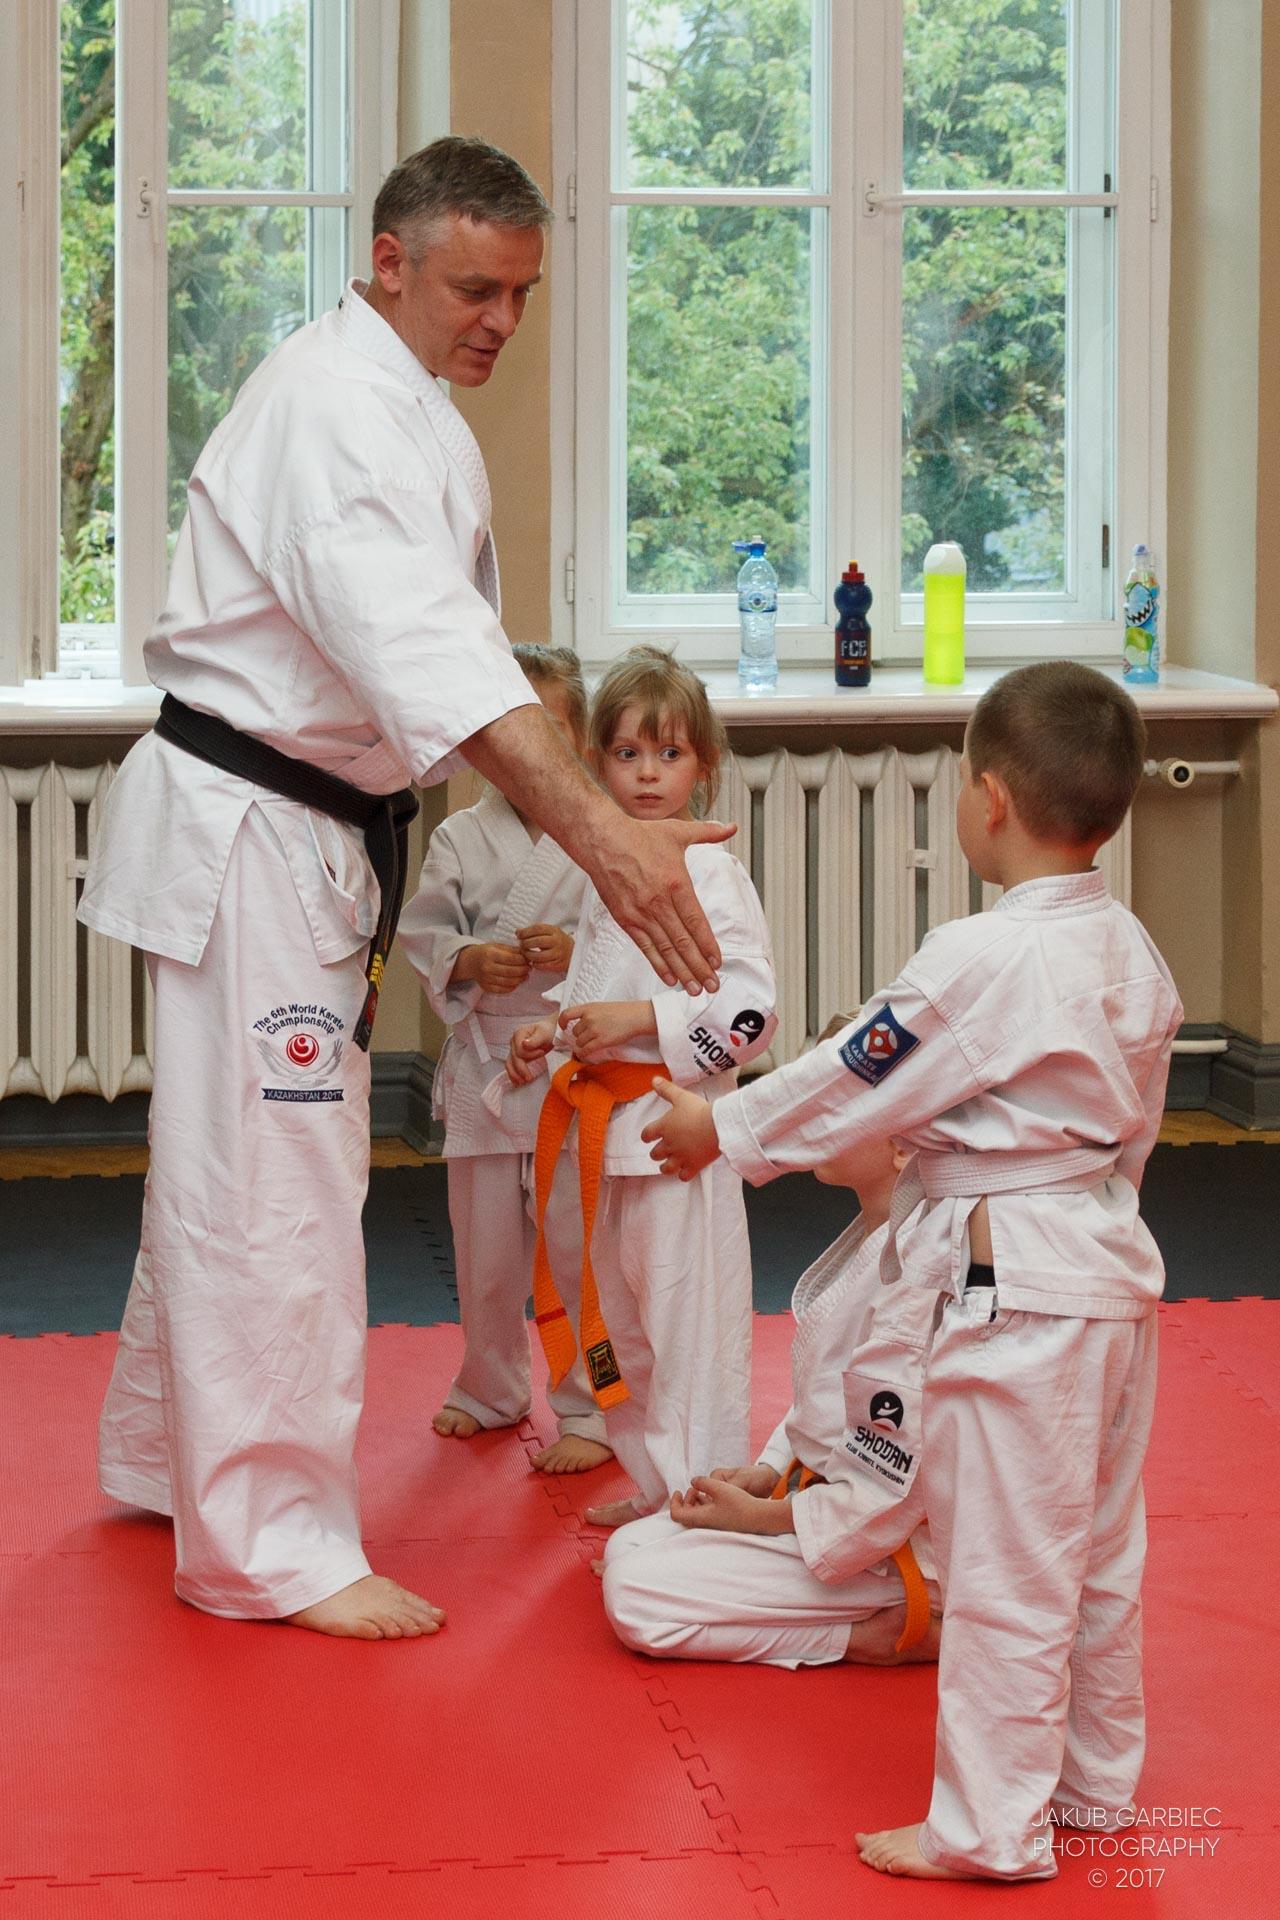 egzamin-karate-mistrz-mariusz-mazur-klub-karate-shodan-2017-06-02-23